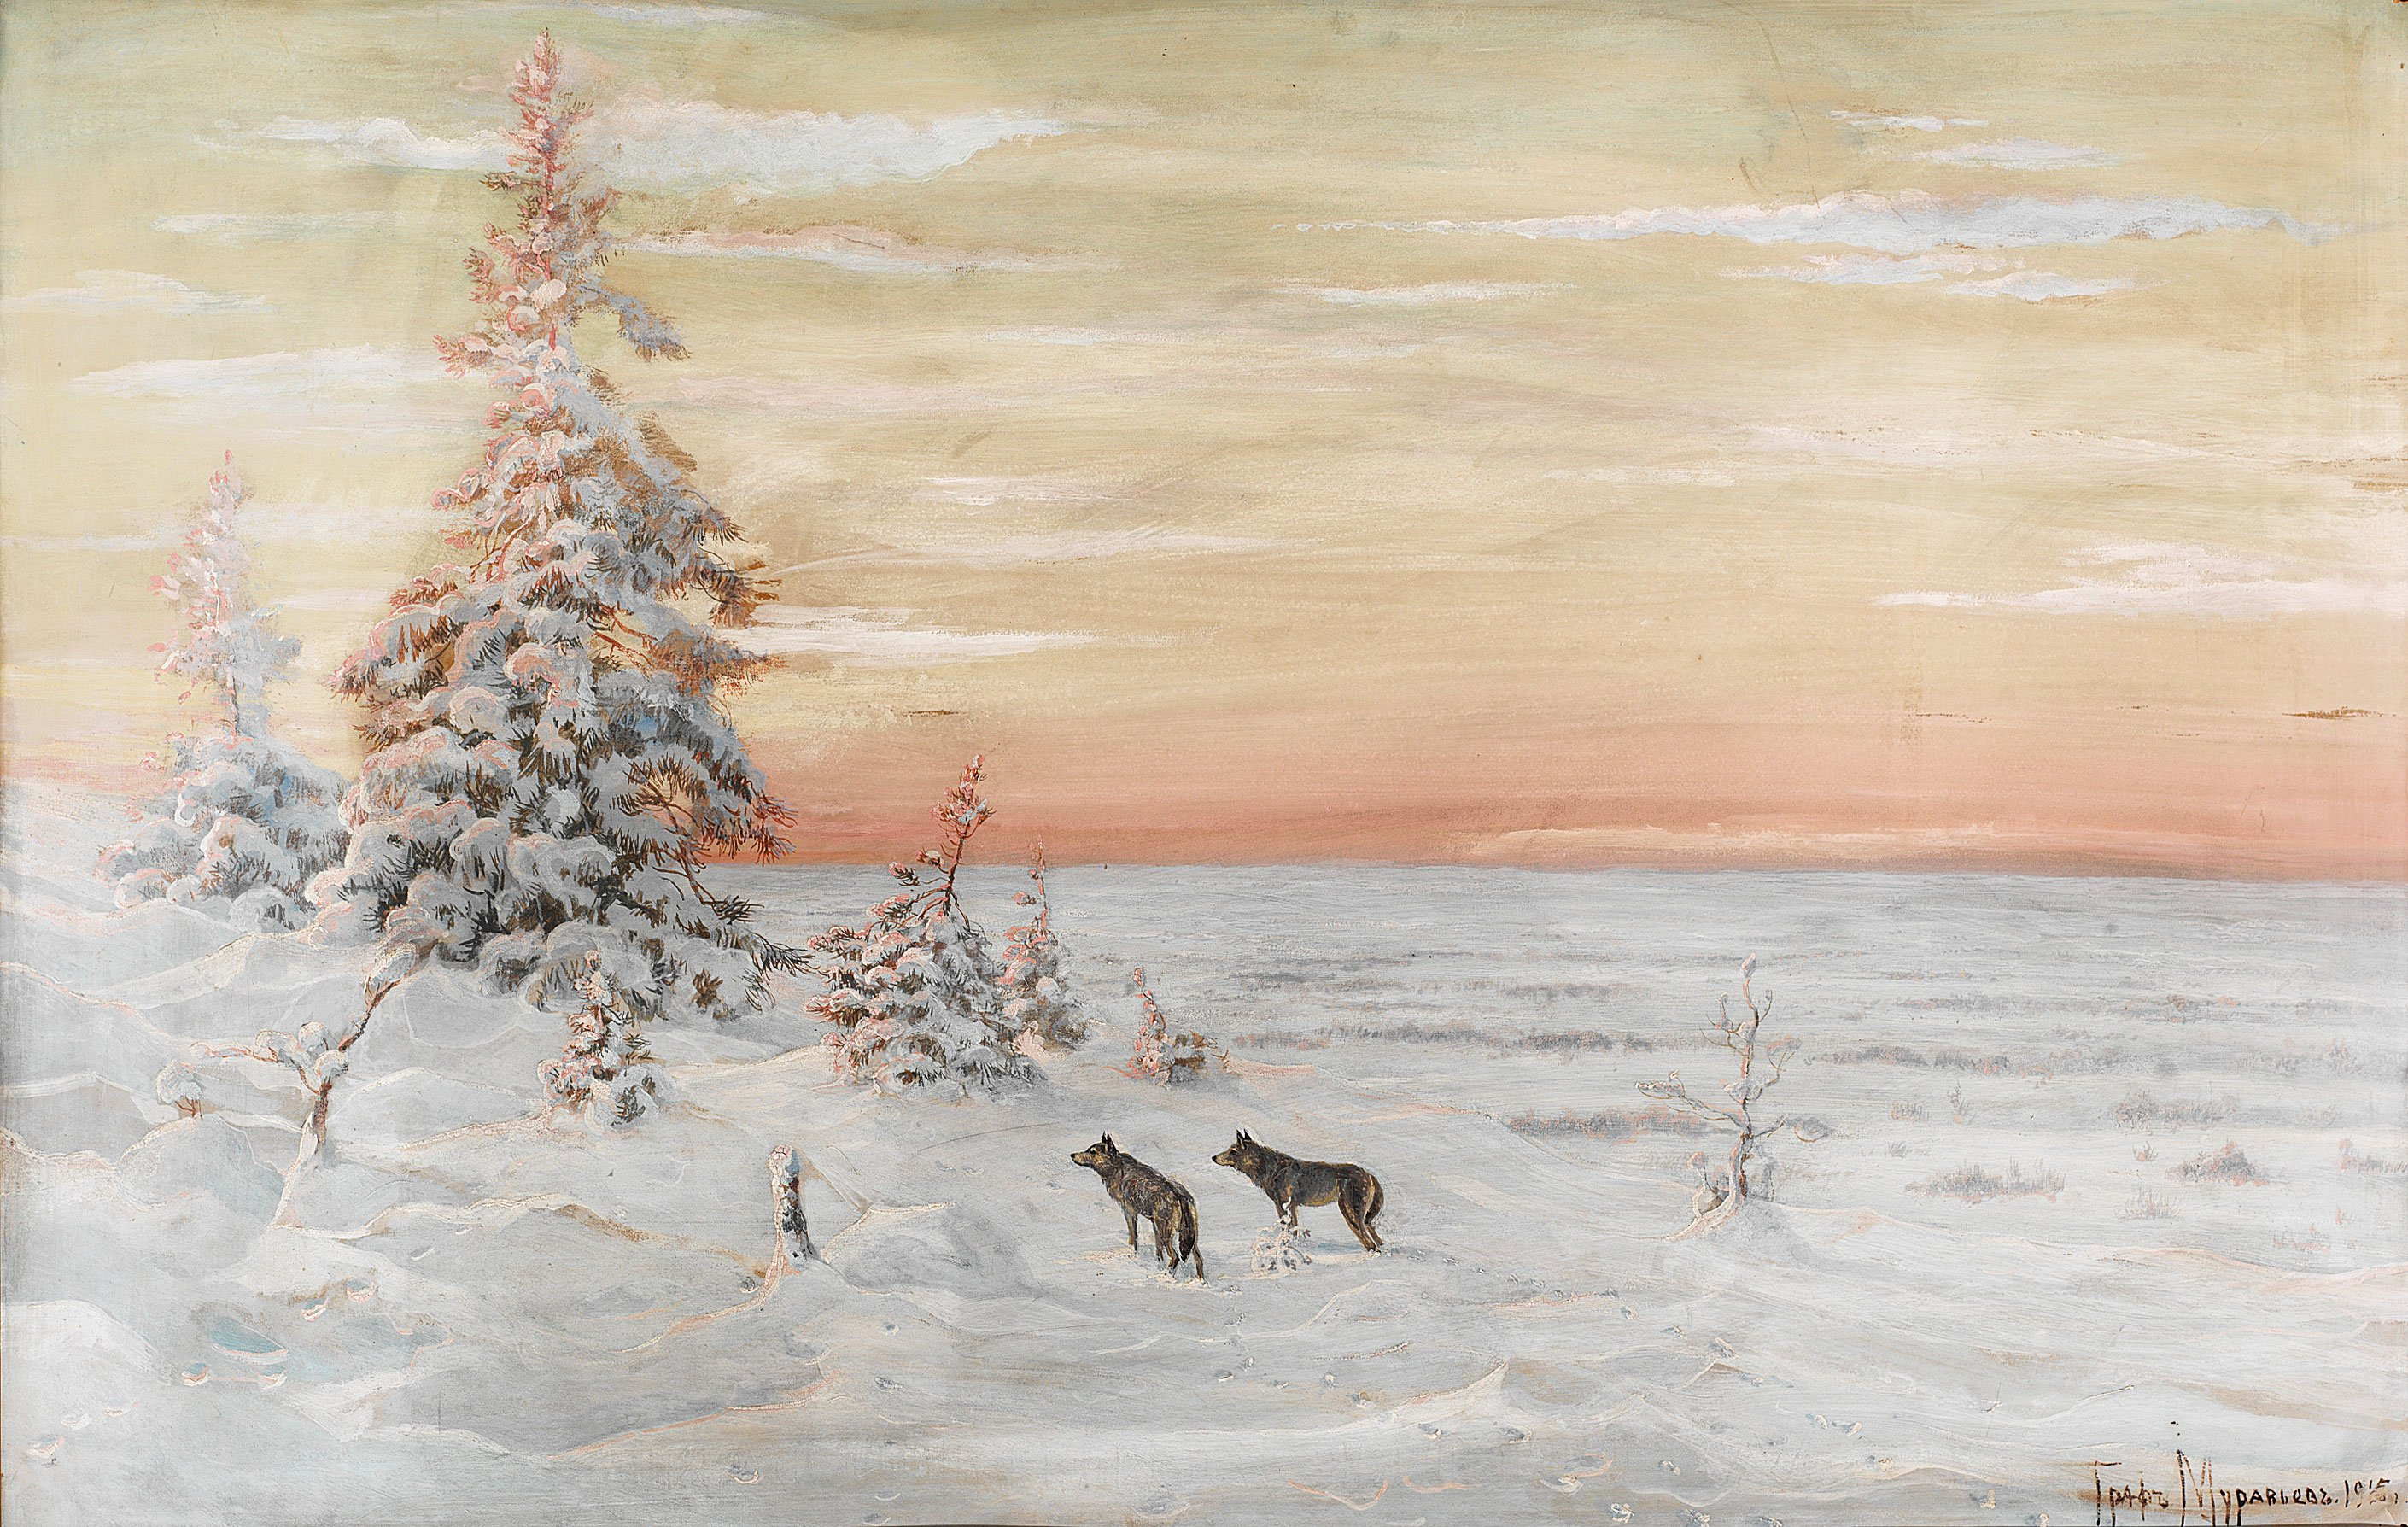 VARGAR I VINTERLANDSKAP av GREVE VLADIMIR MURAVIOV Konsttryck på duk